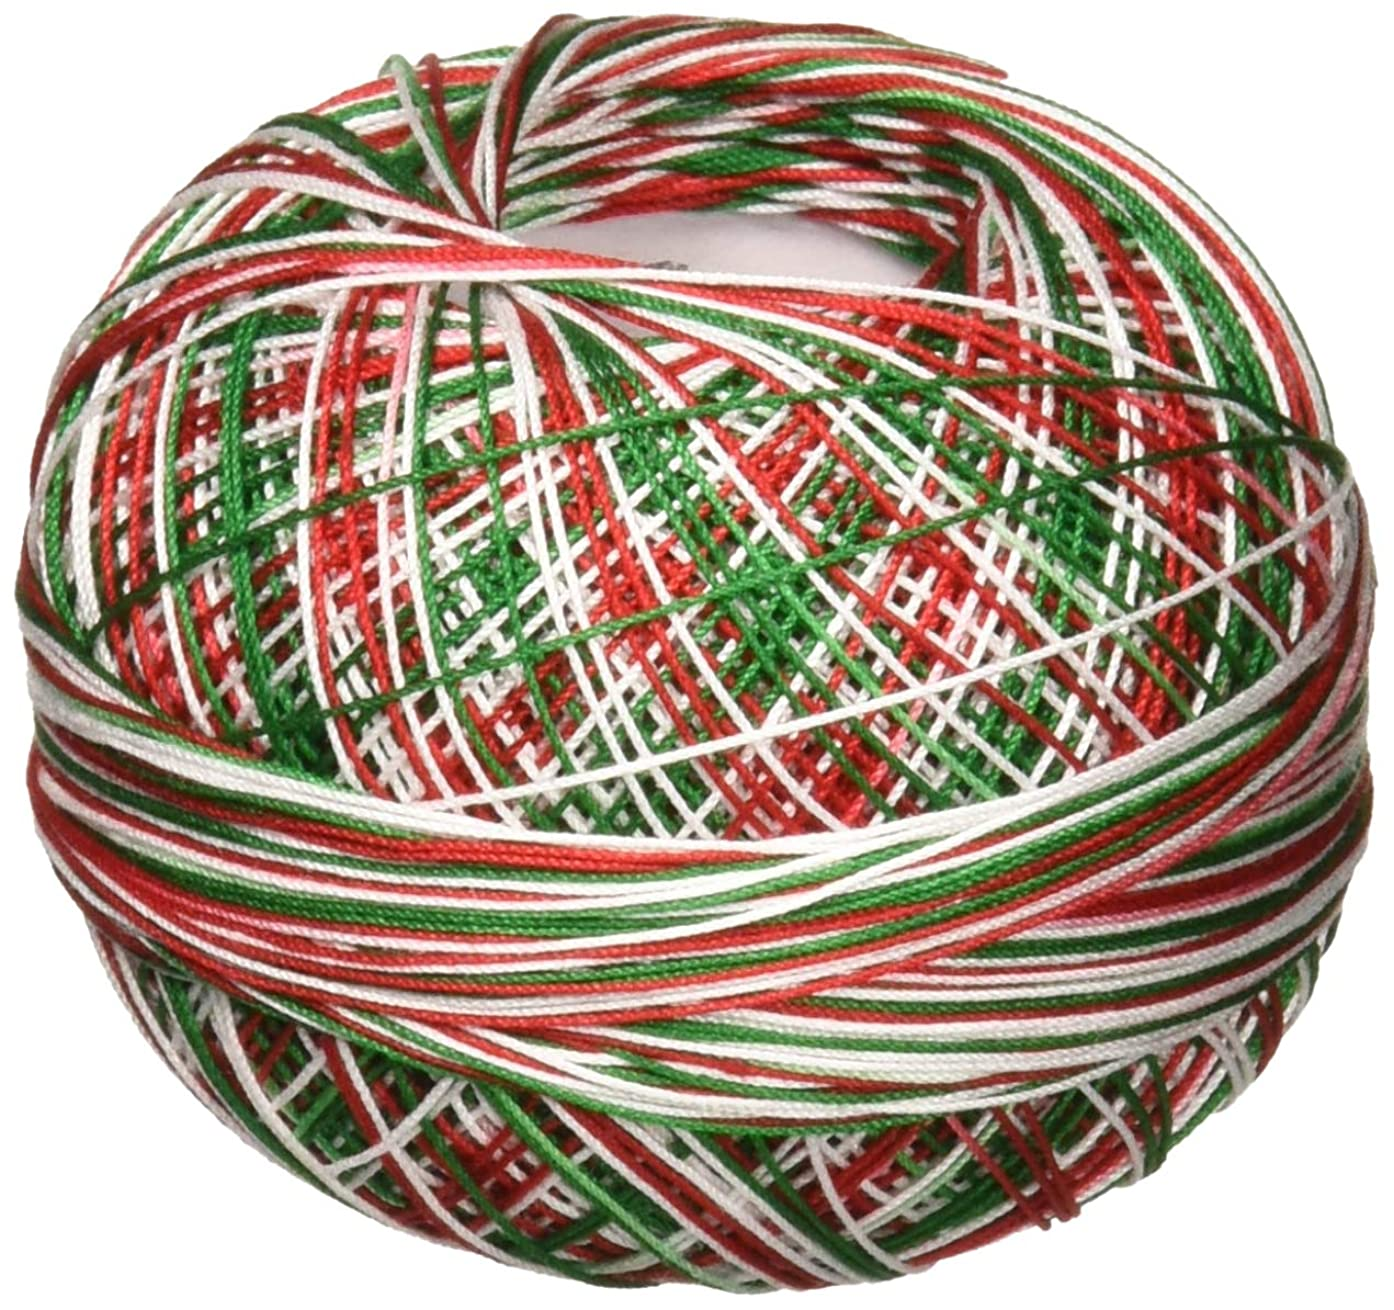 Handy Hands Lizbeth Premium Cotton Thread, Size 40, Christmas Delight